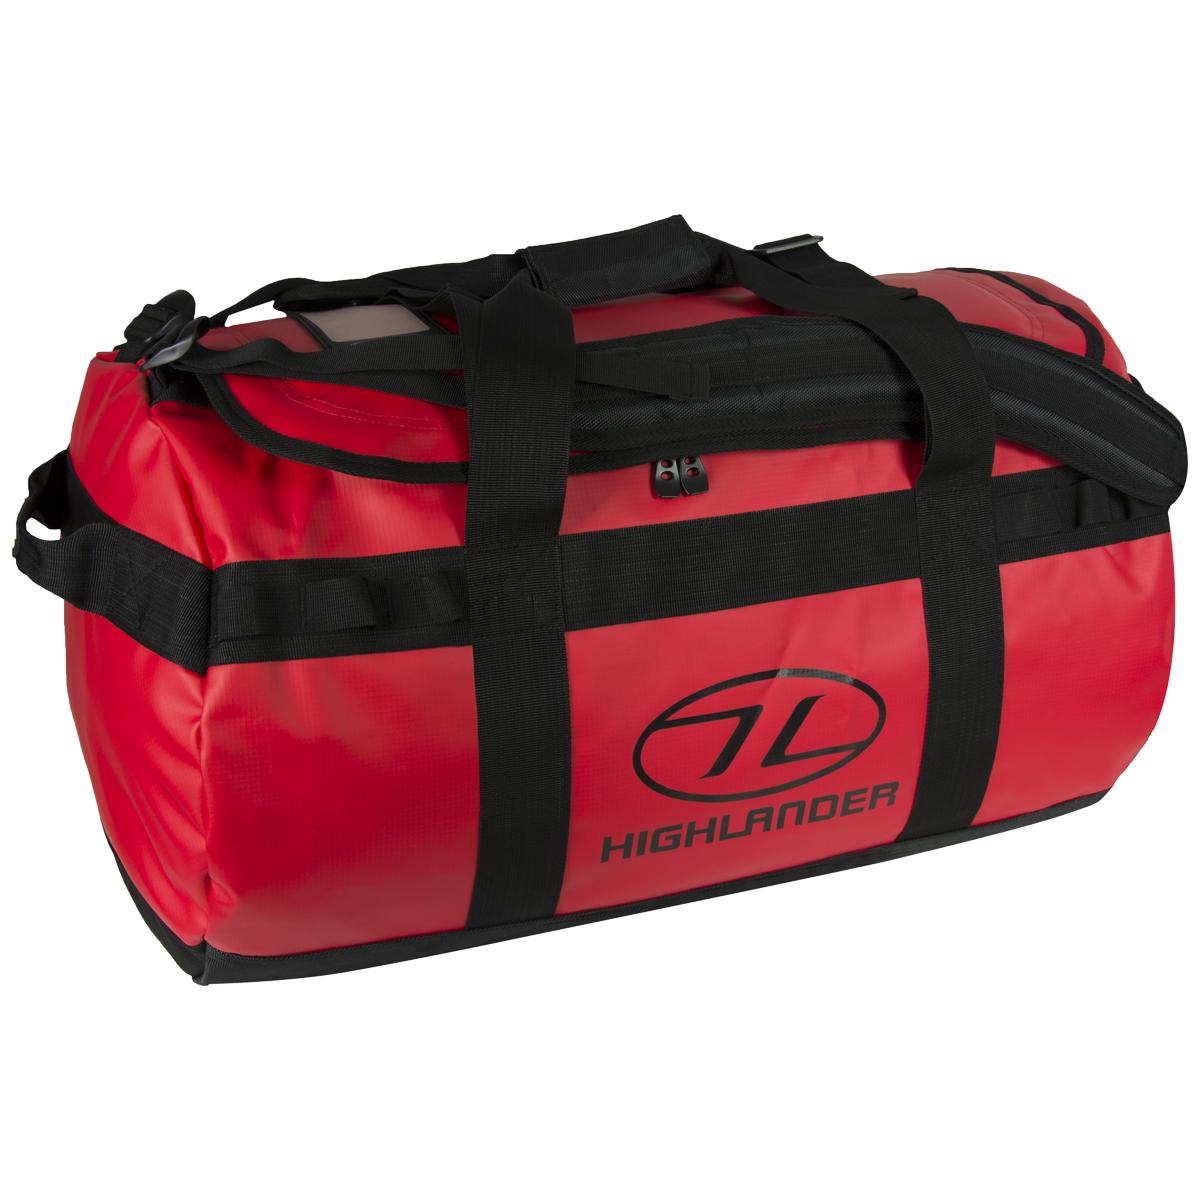 Details about Highlander Lomond Tarpaulin Duffle 65L Tough Durable Heavy  Duty Holdall Bag Red c2aef2264c408